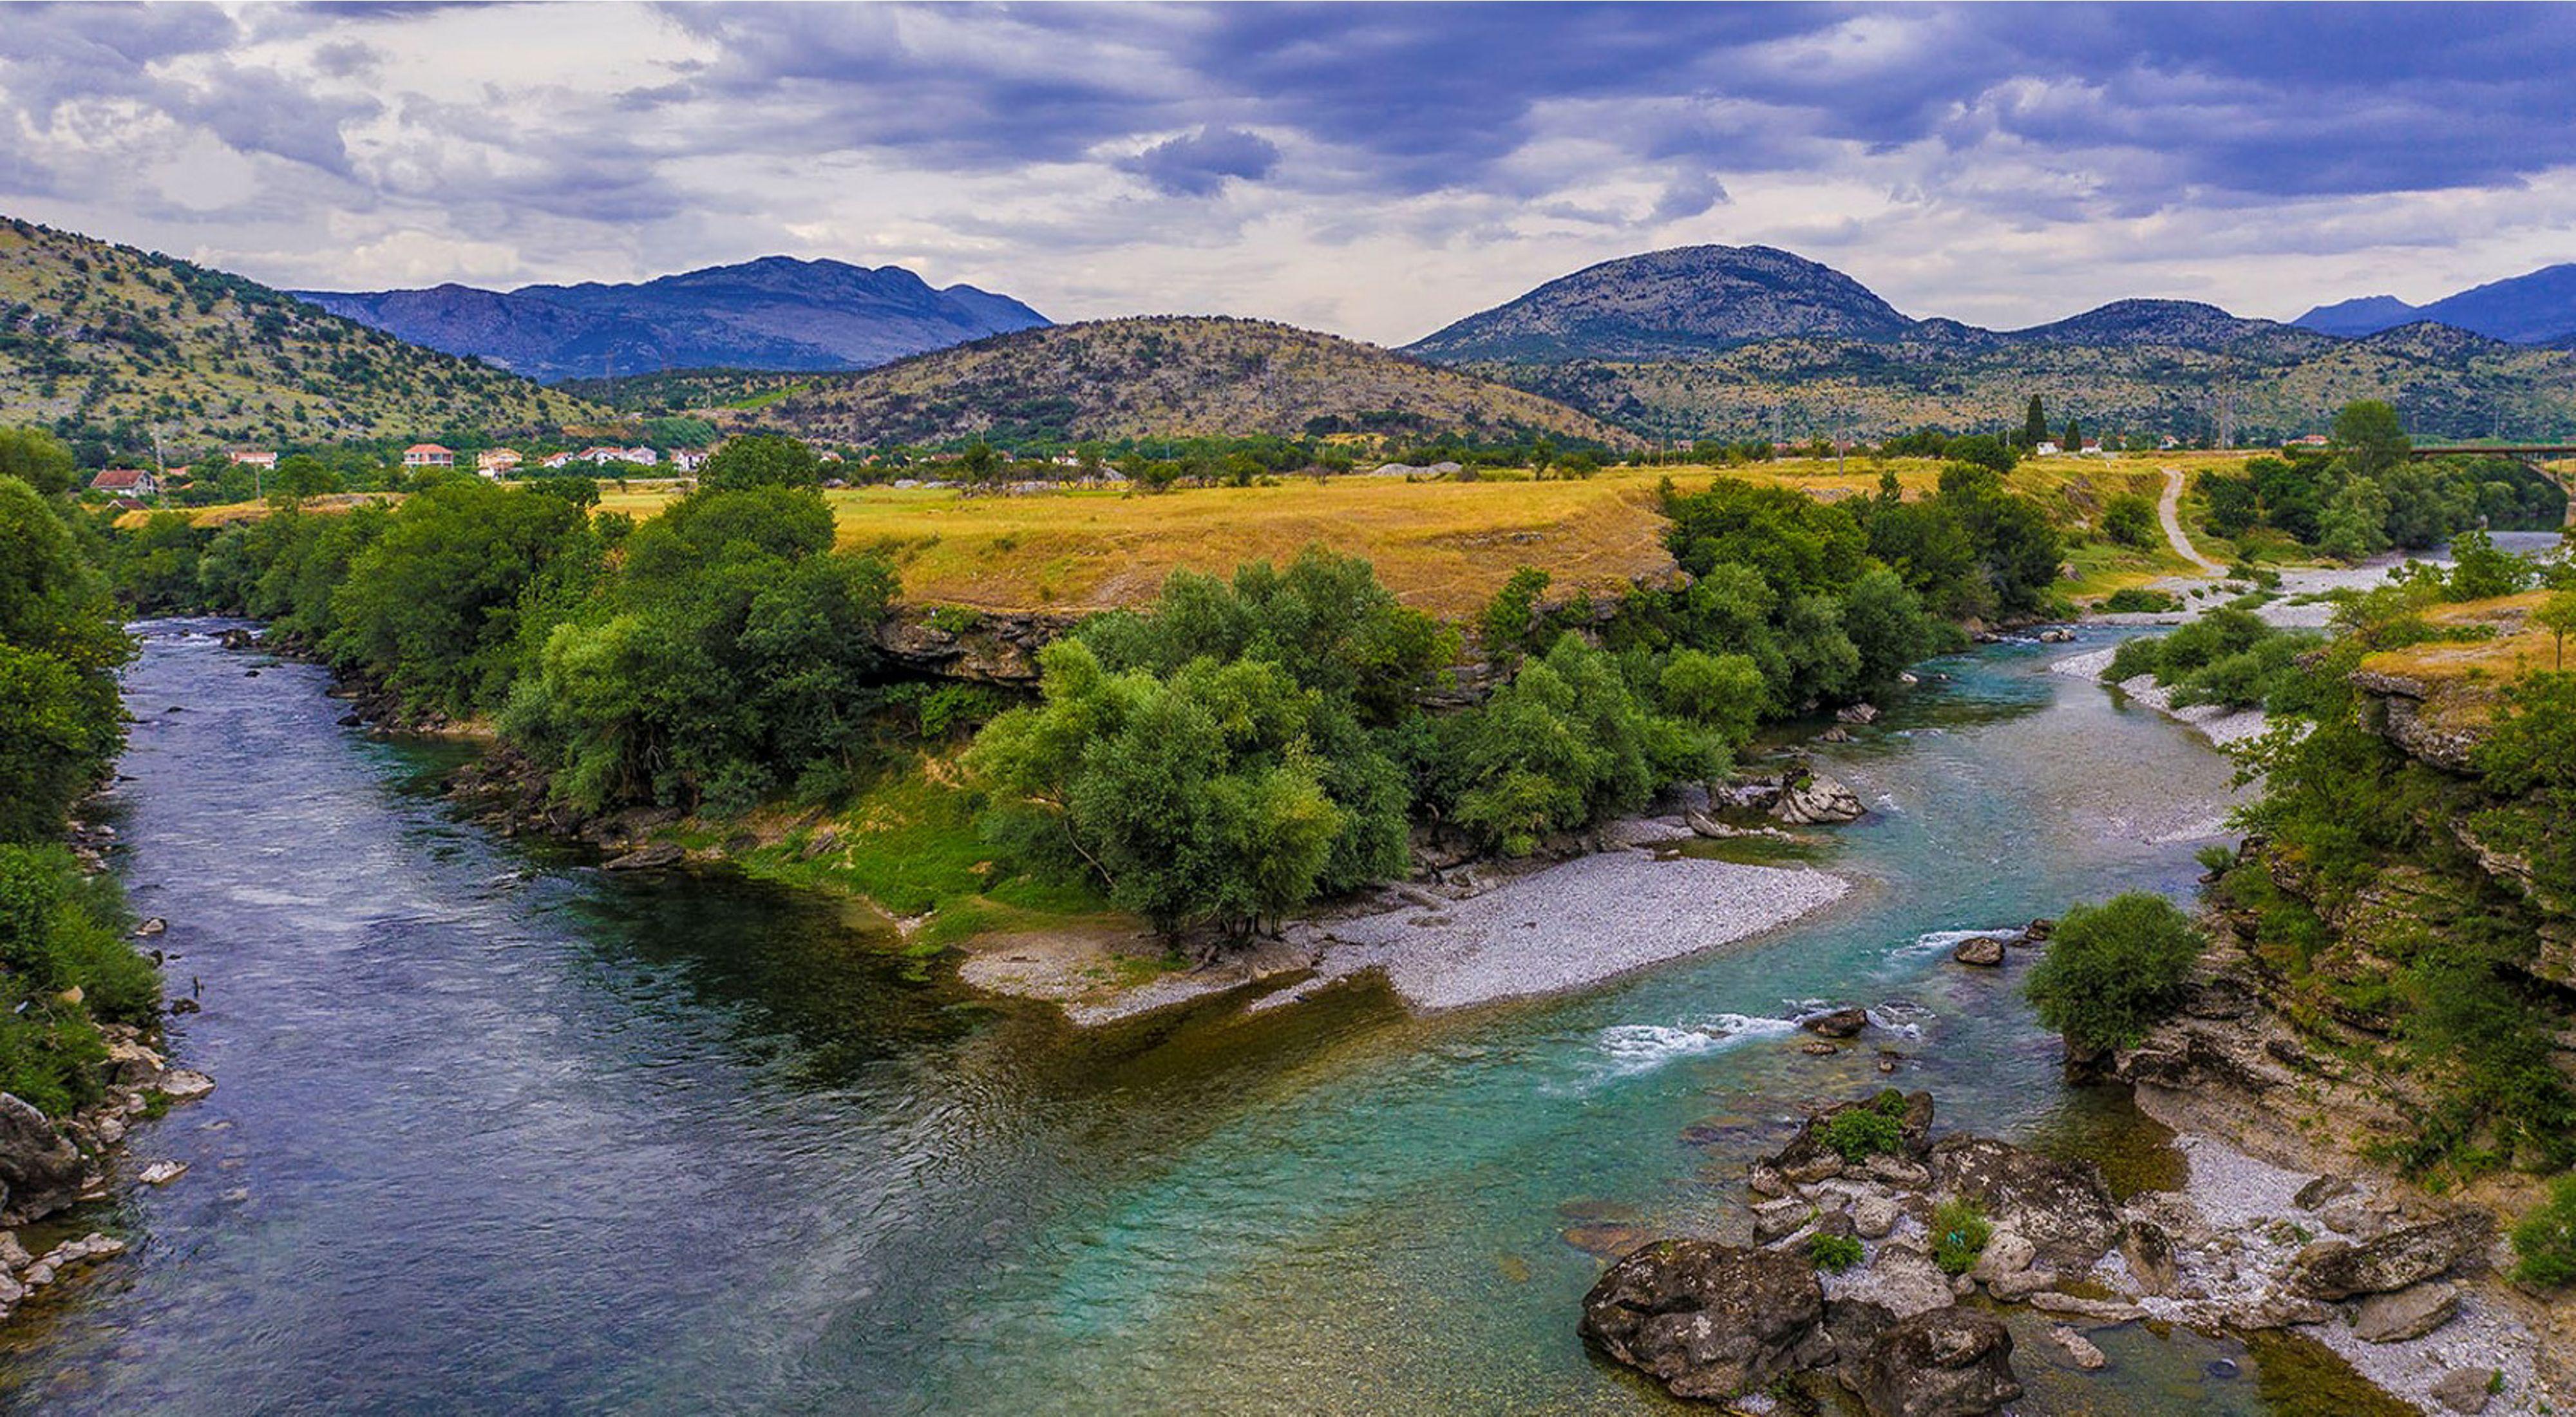 River confluence